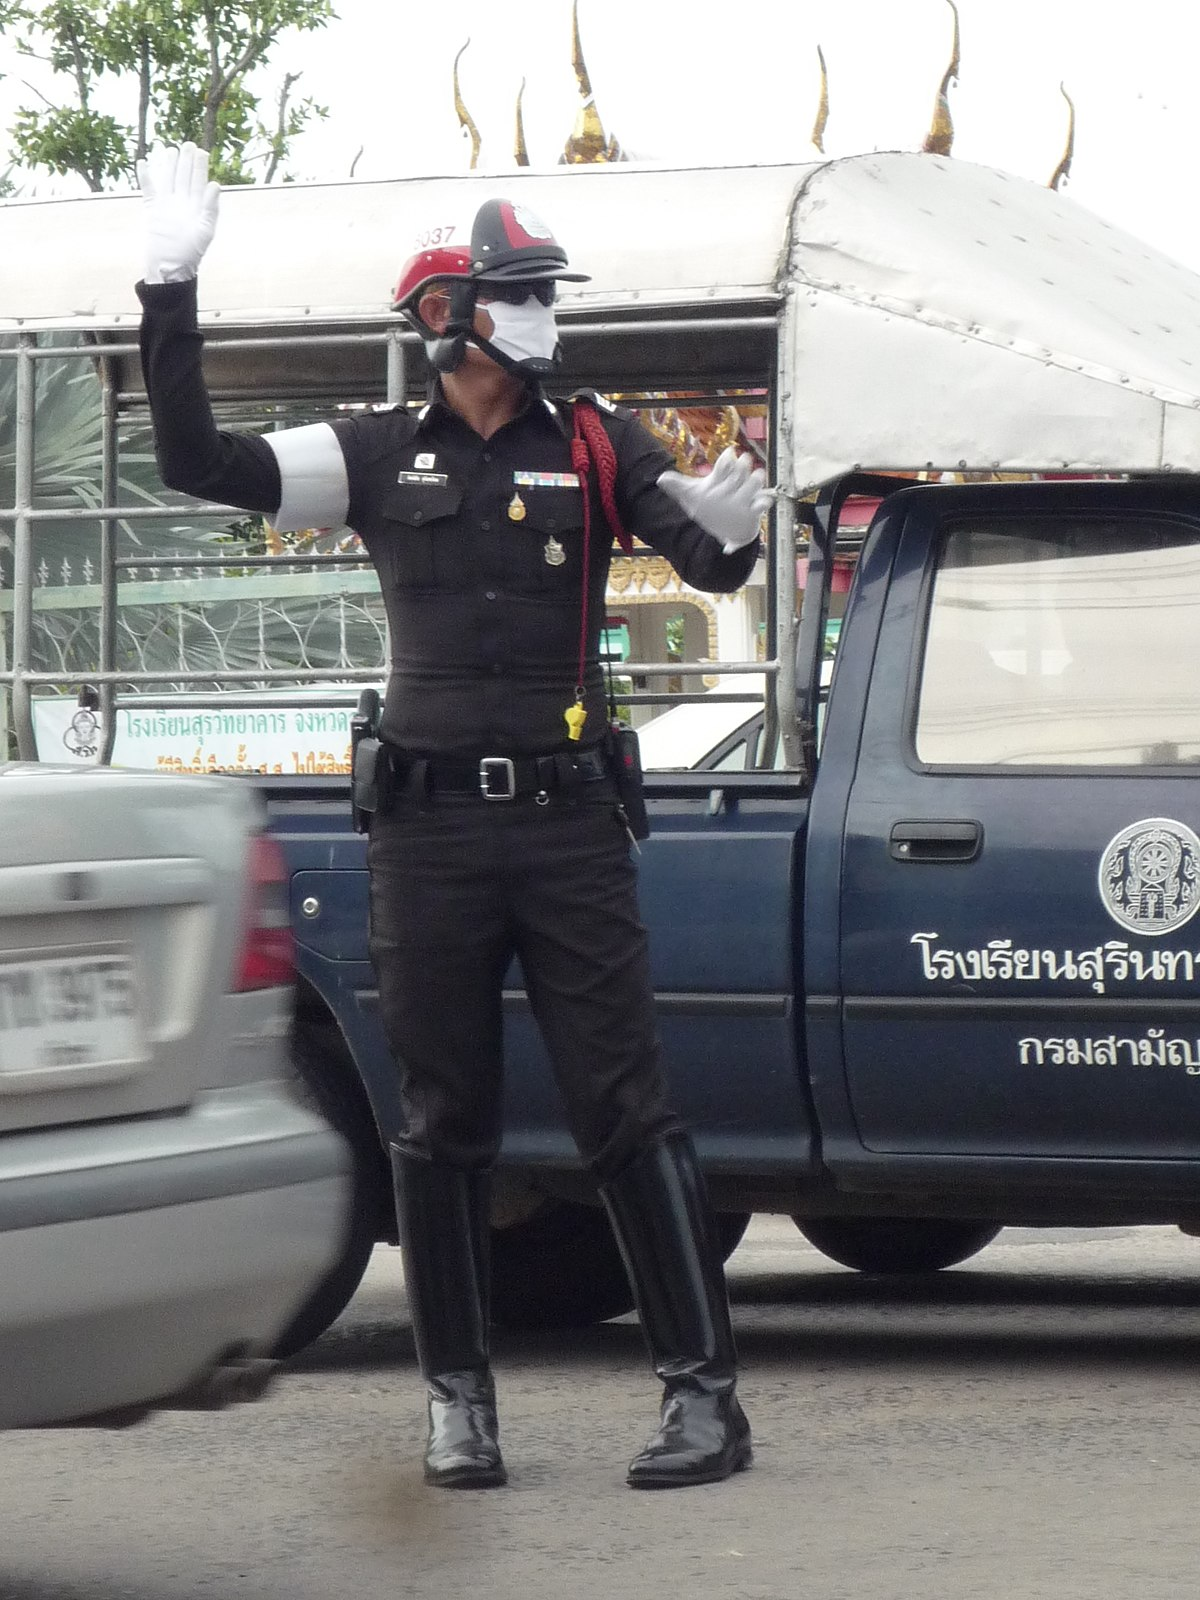 Polisi - Wikipedia bahasa Indonesia, ensiklopedia bebas